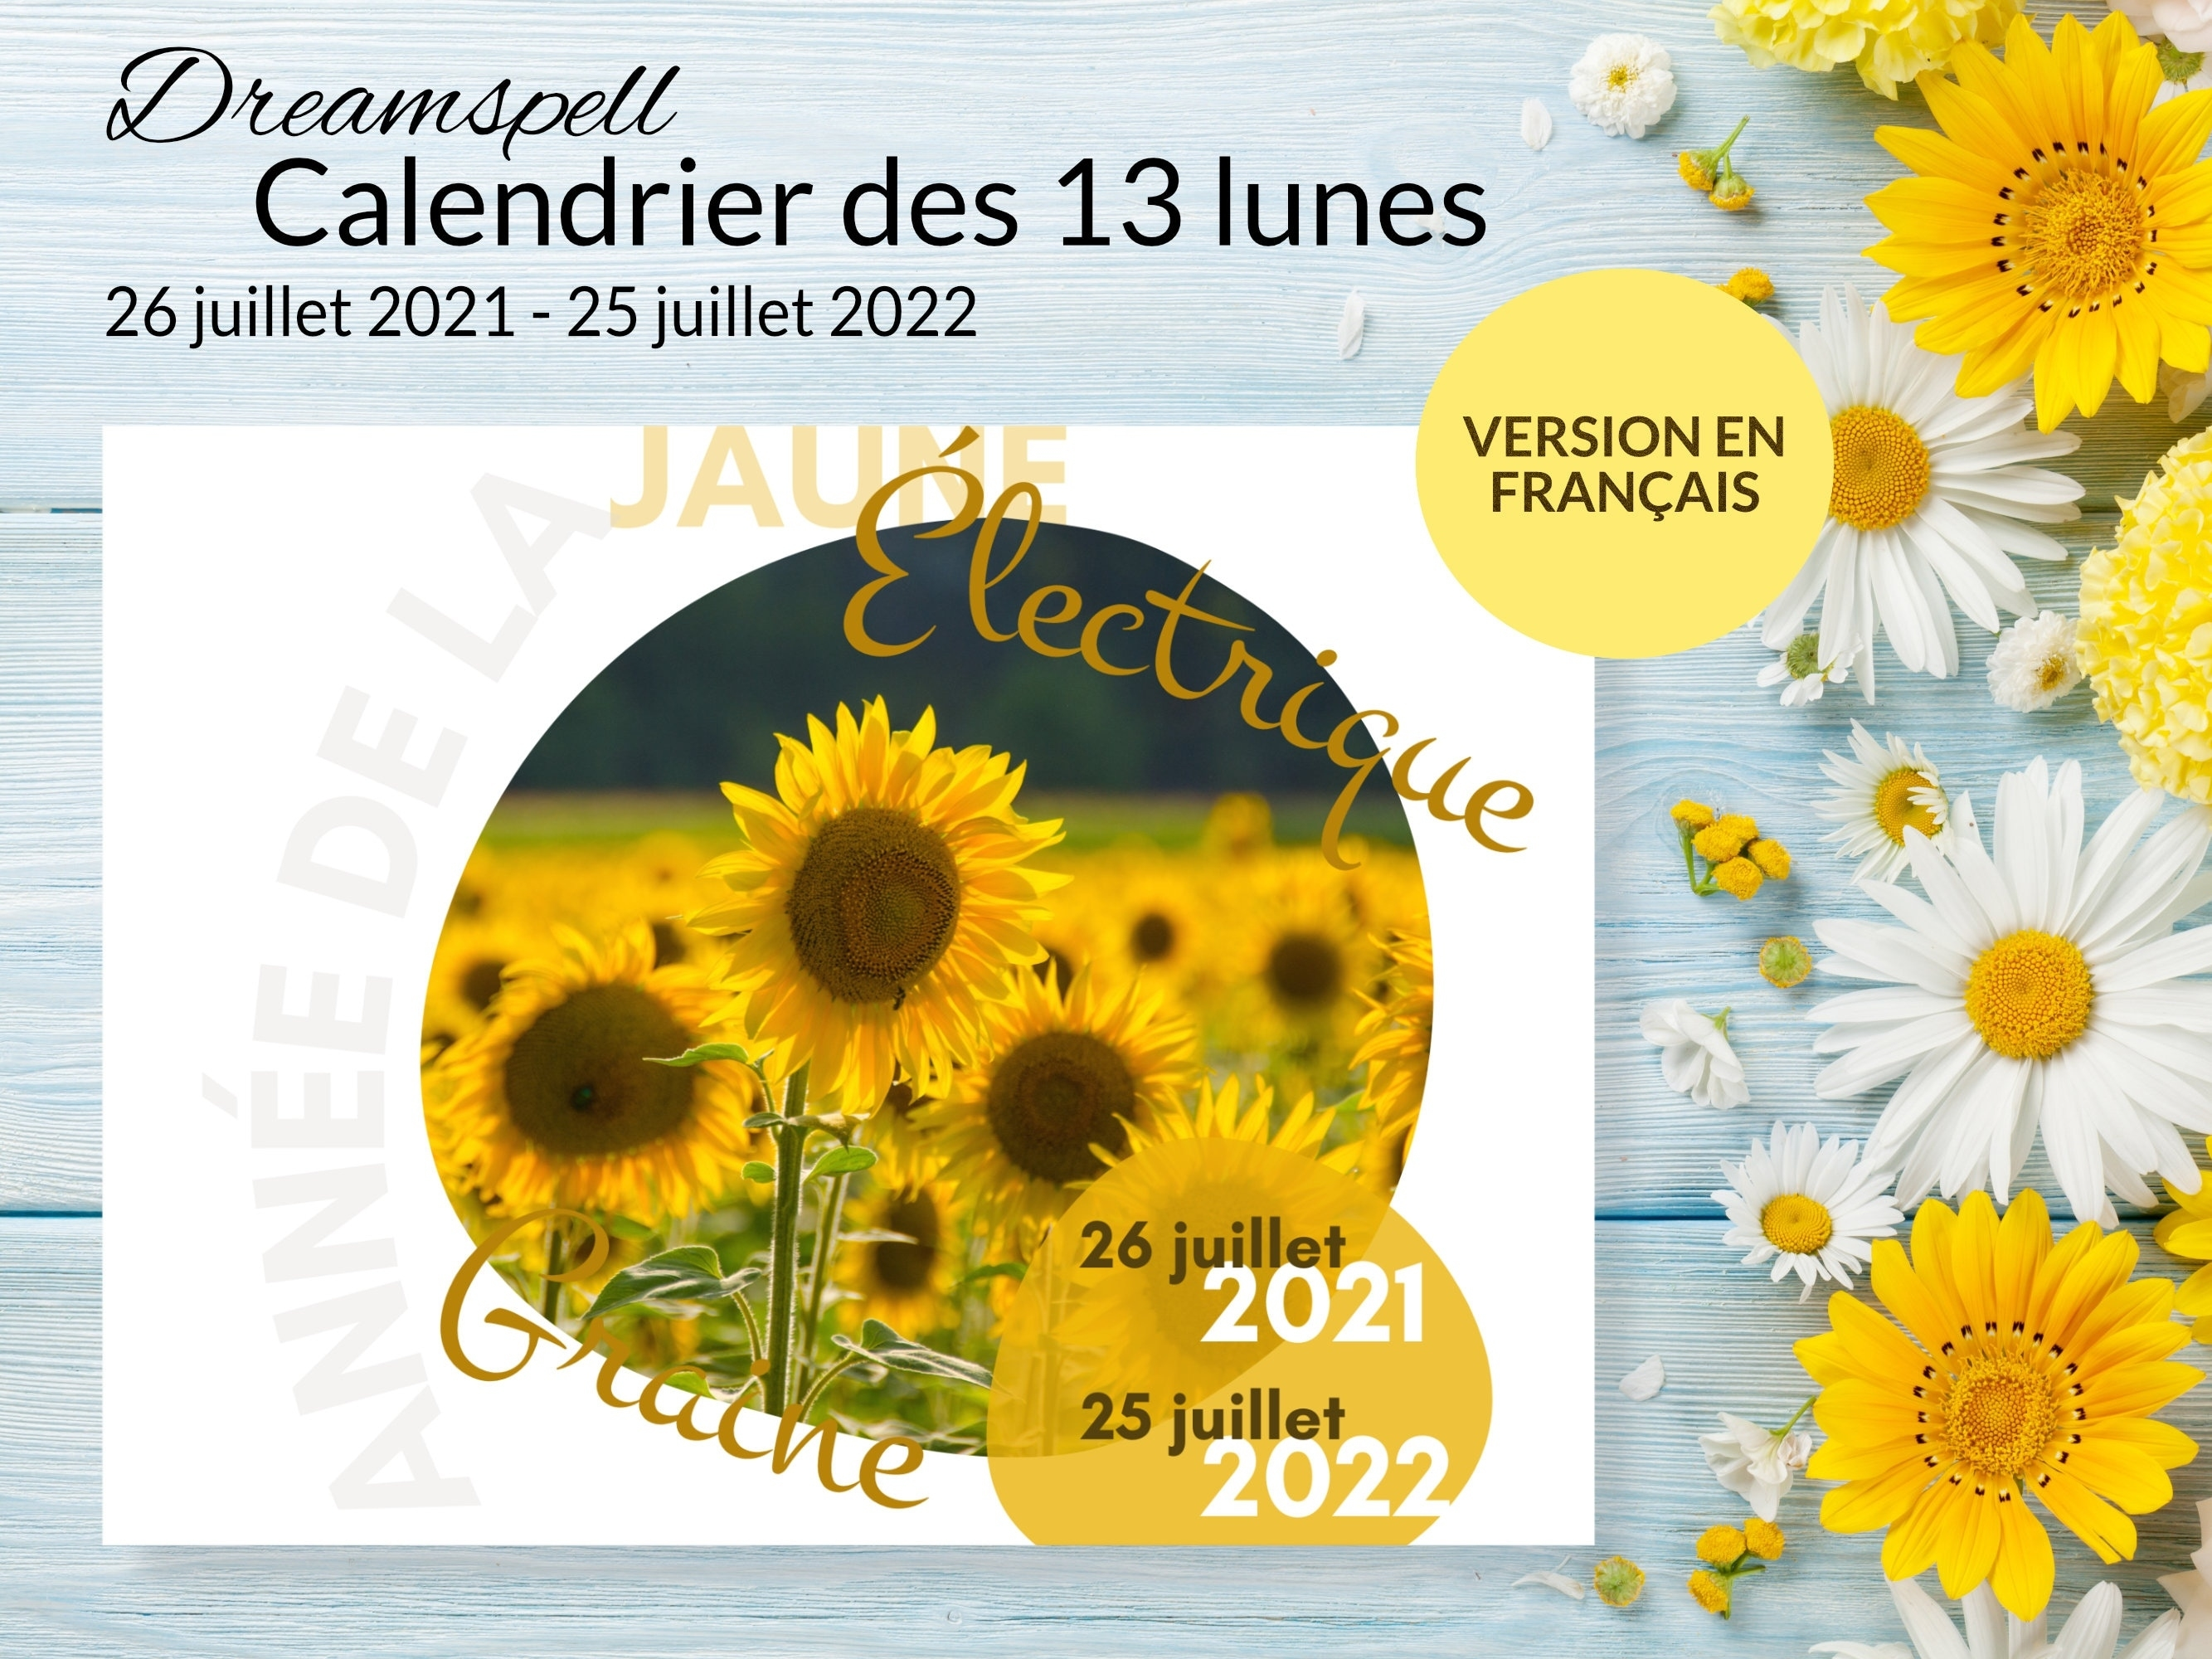 13 Moon Calendar: July 26 2021 July 25 2022 Dreamspell | Etsy July 2021 Lunar Calendar